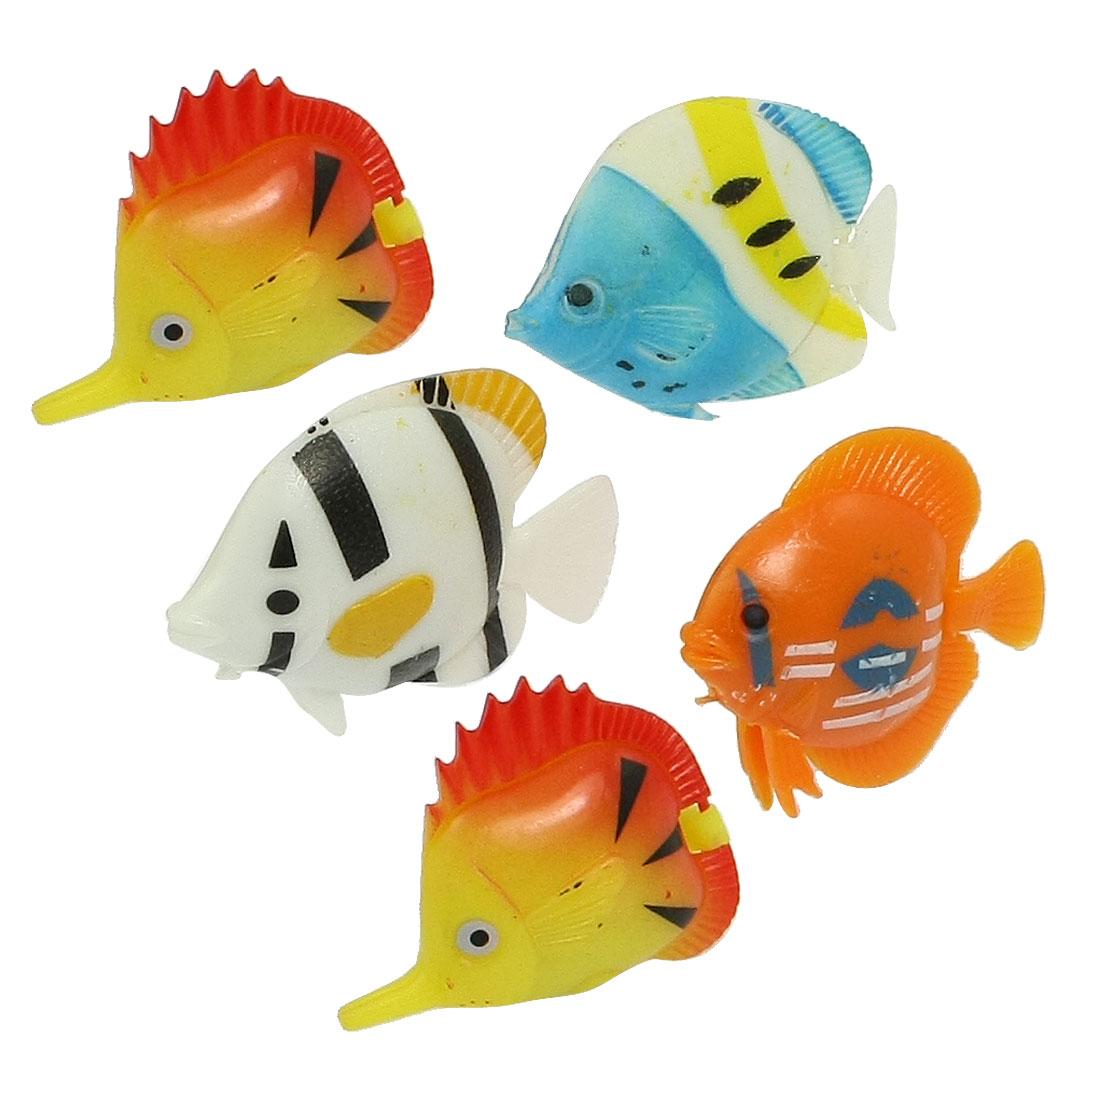 5 Pcs Strips Printed Assorted Color Plastic Fishes for Aquarium